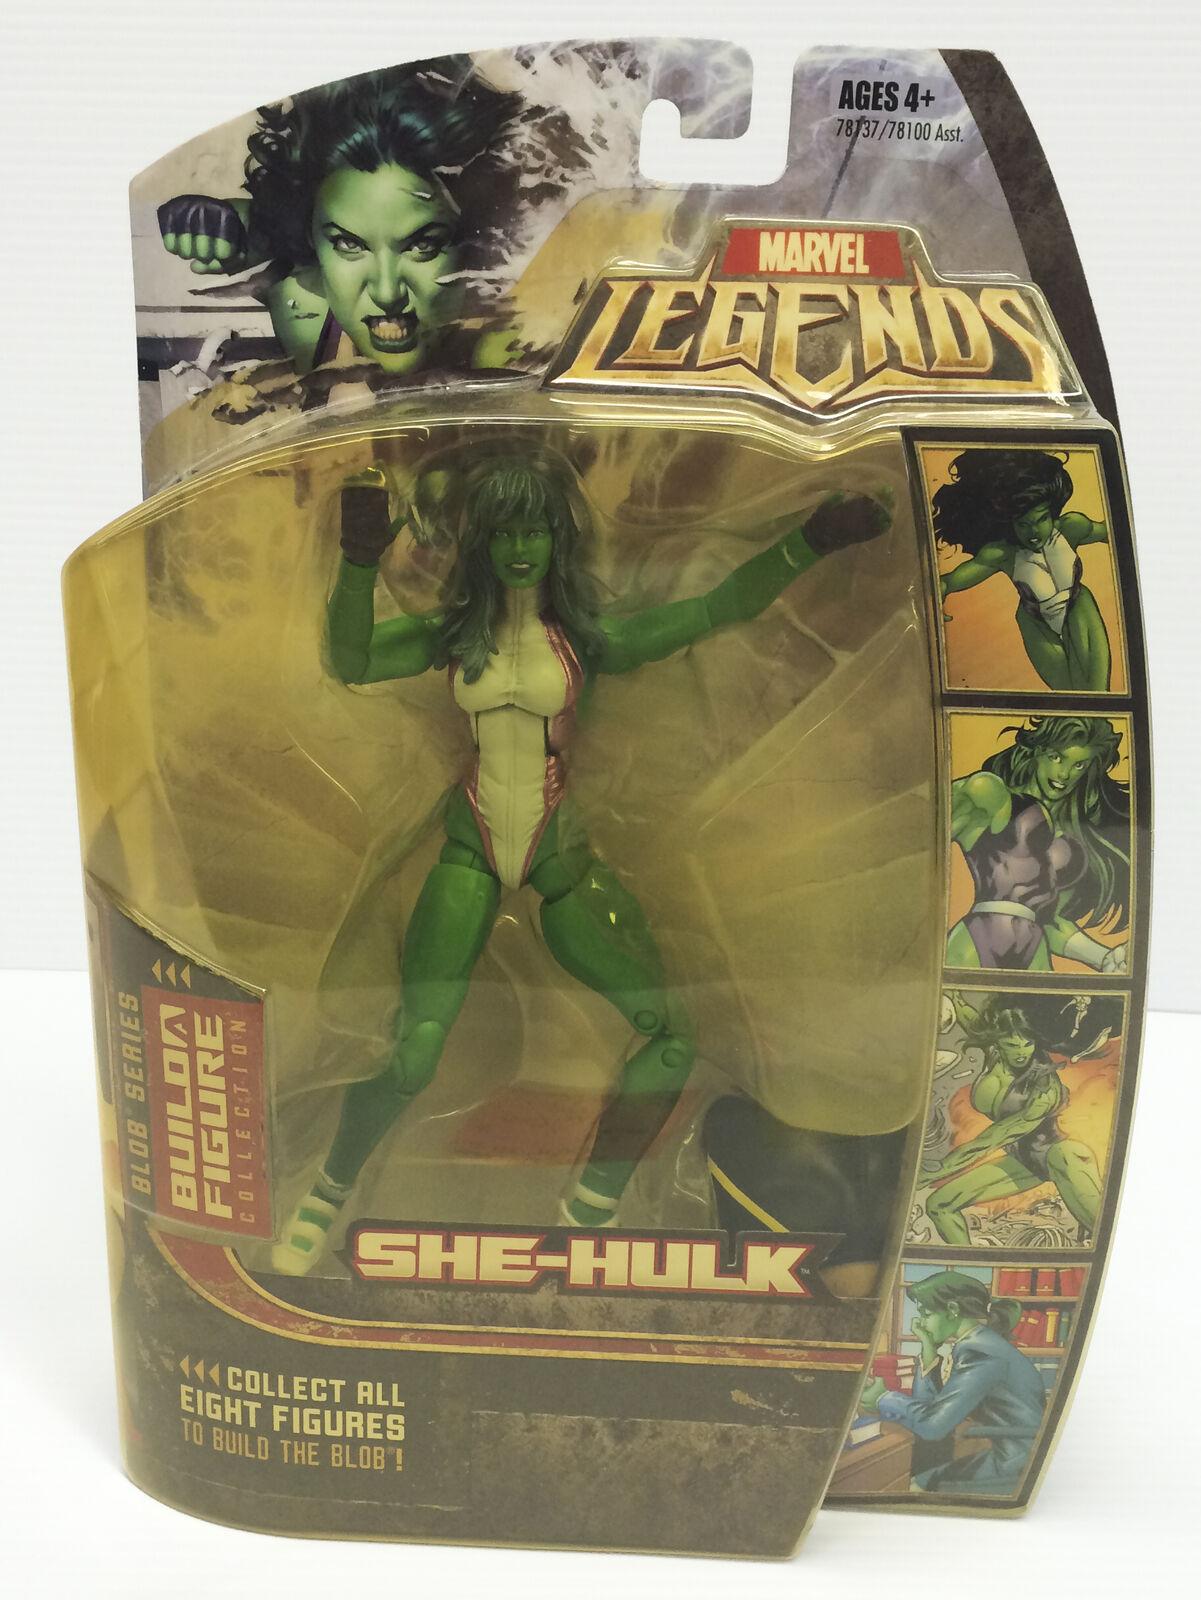 Marvel Legends SHE-HULK Hasbro Action Figure BAF BLOB - NIB Cleaned